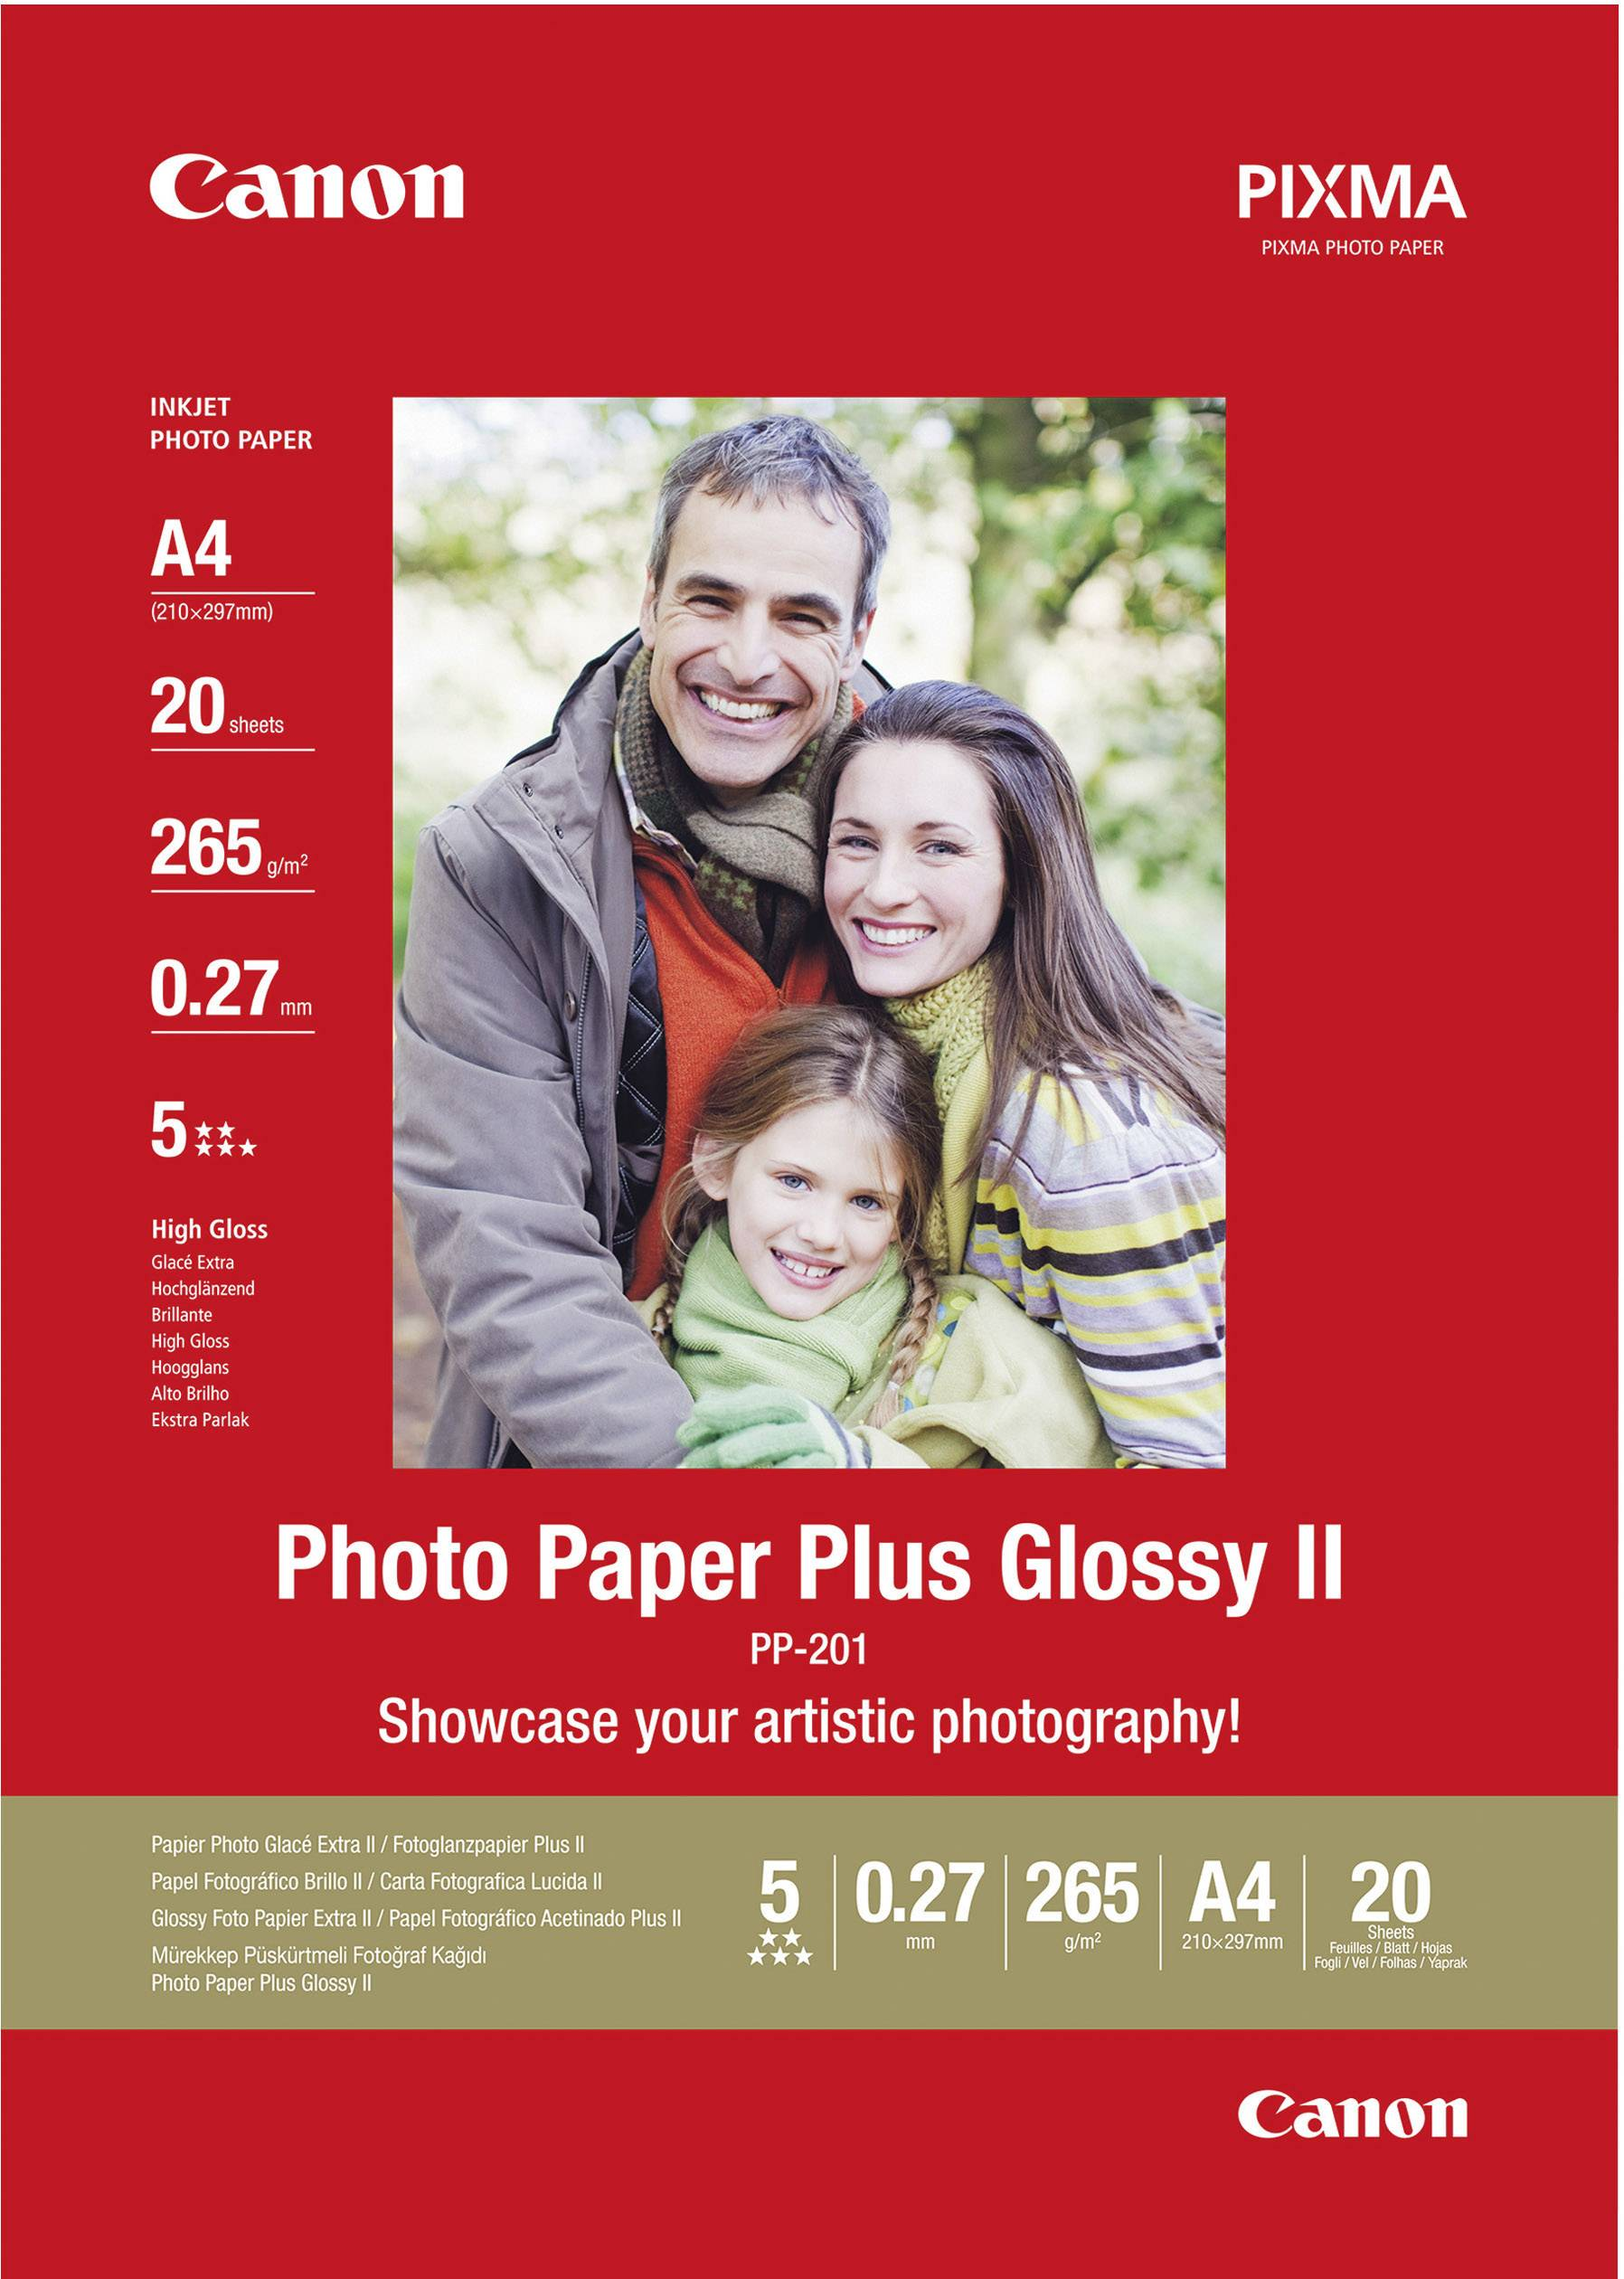 Fotografický papier Canon Photo Paper Plus Glossy II PP-201 2311B019, A4, 265 gm², 20 listov